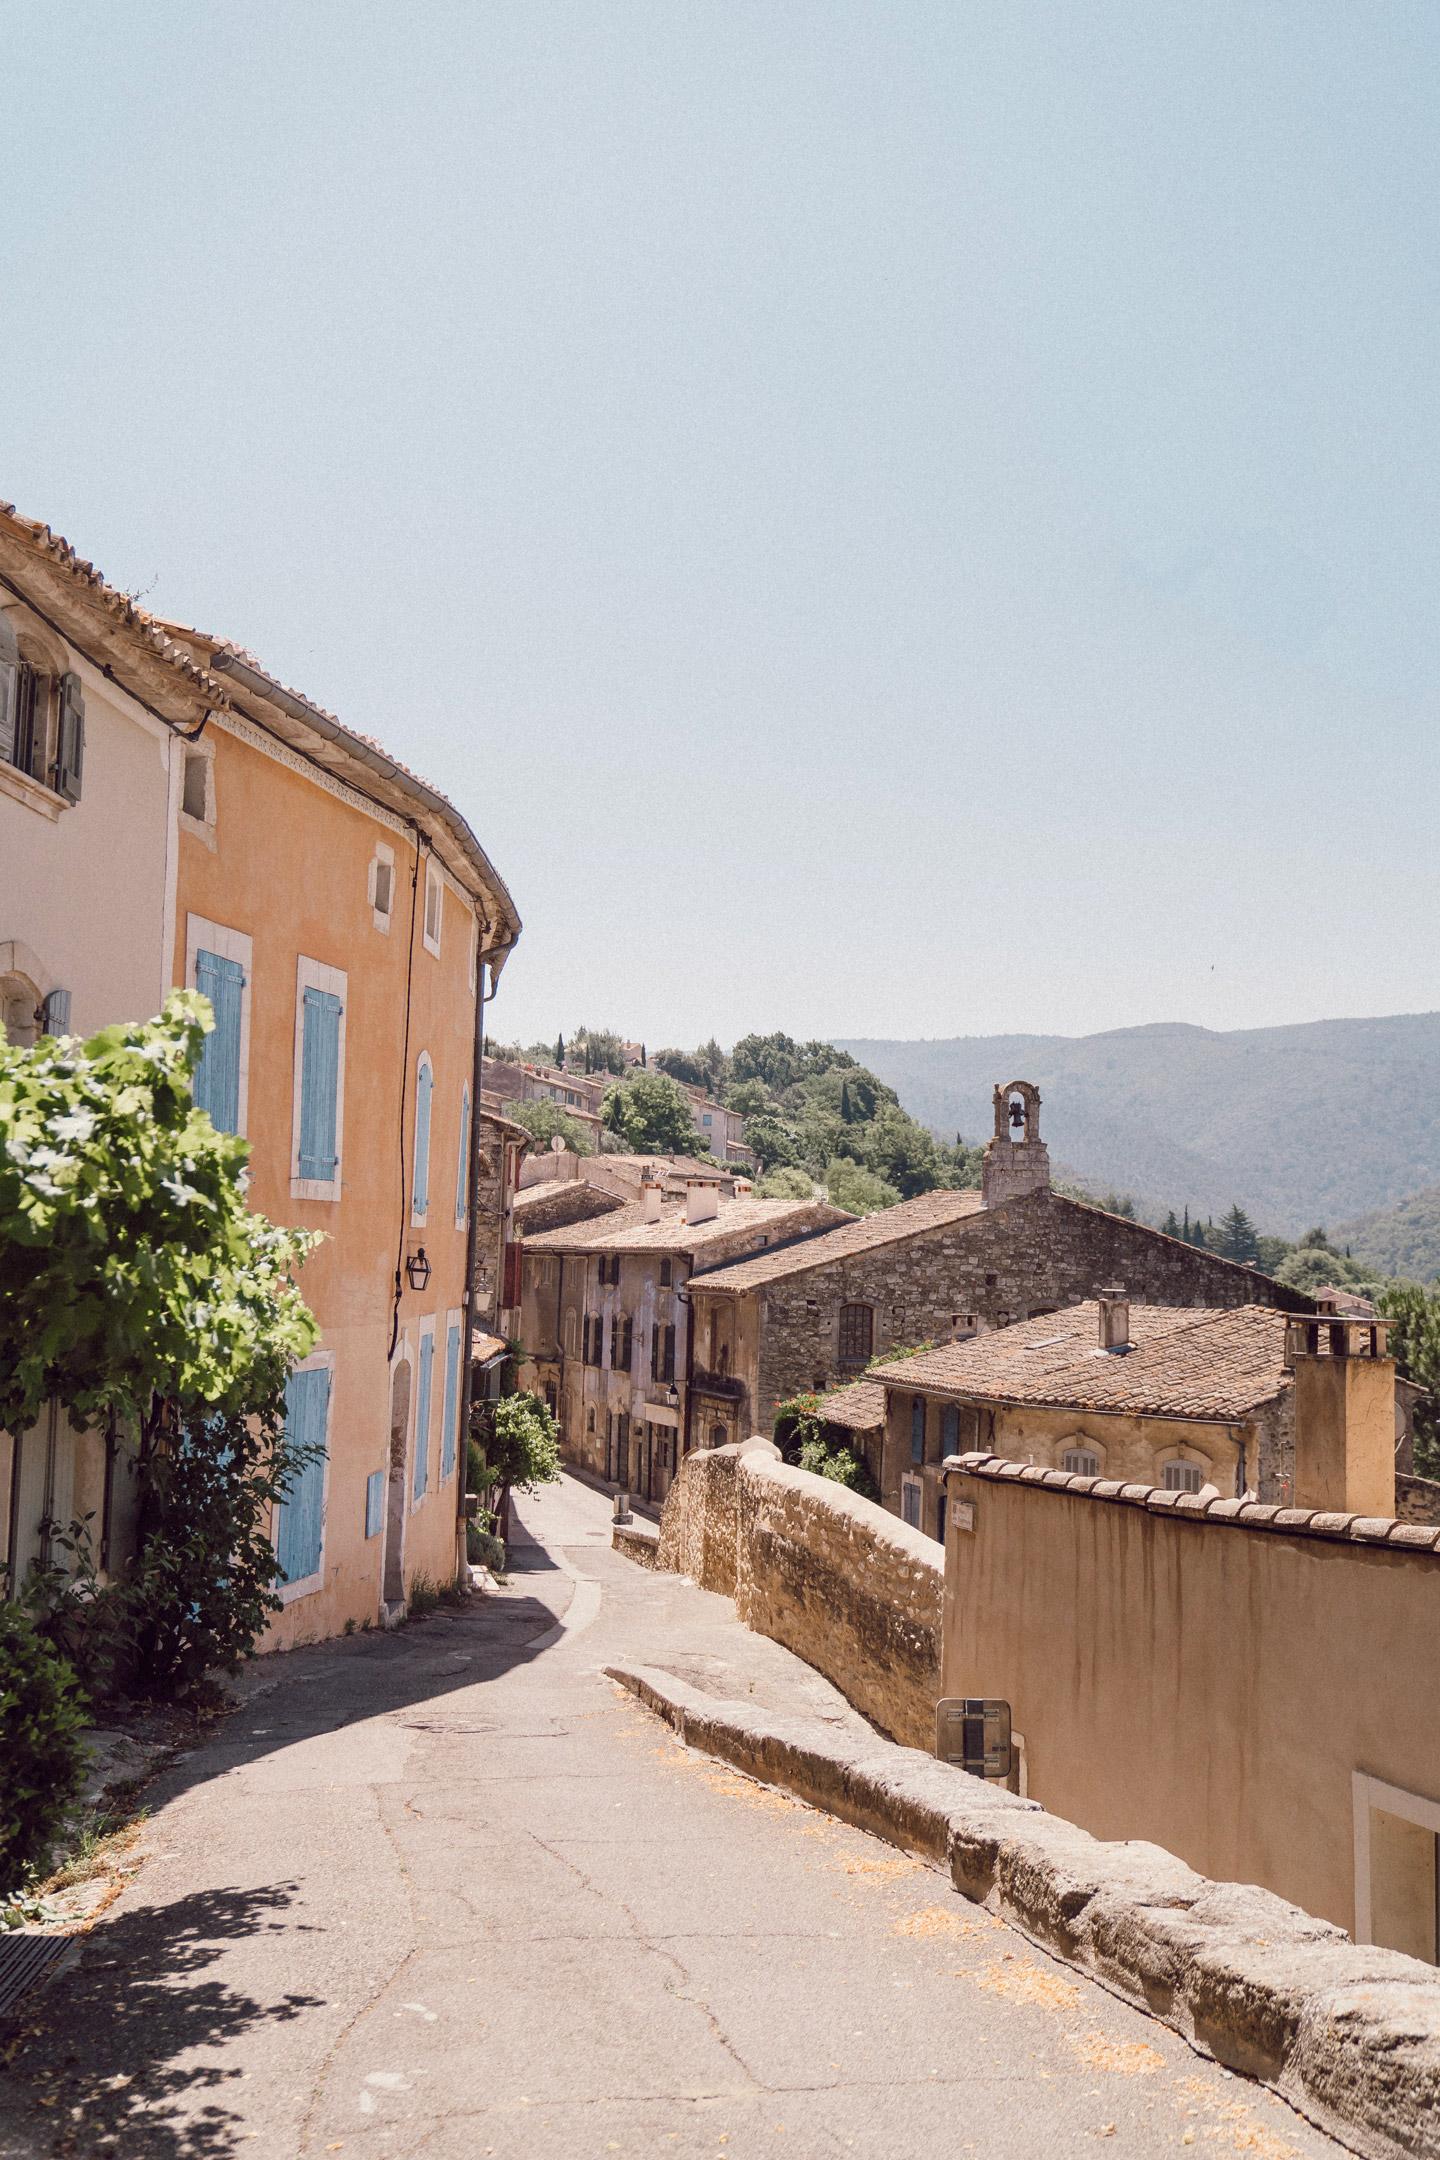 provence-menerbes-oppede-isle-sur-la-sorgue-28